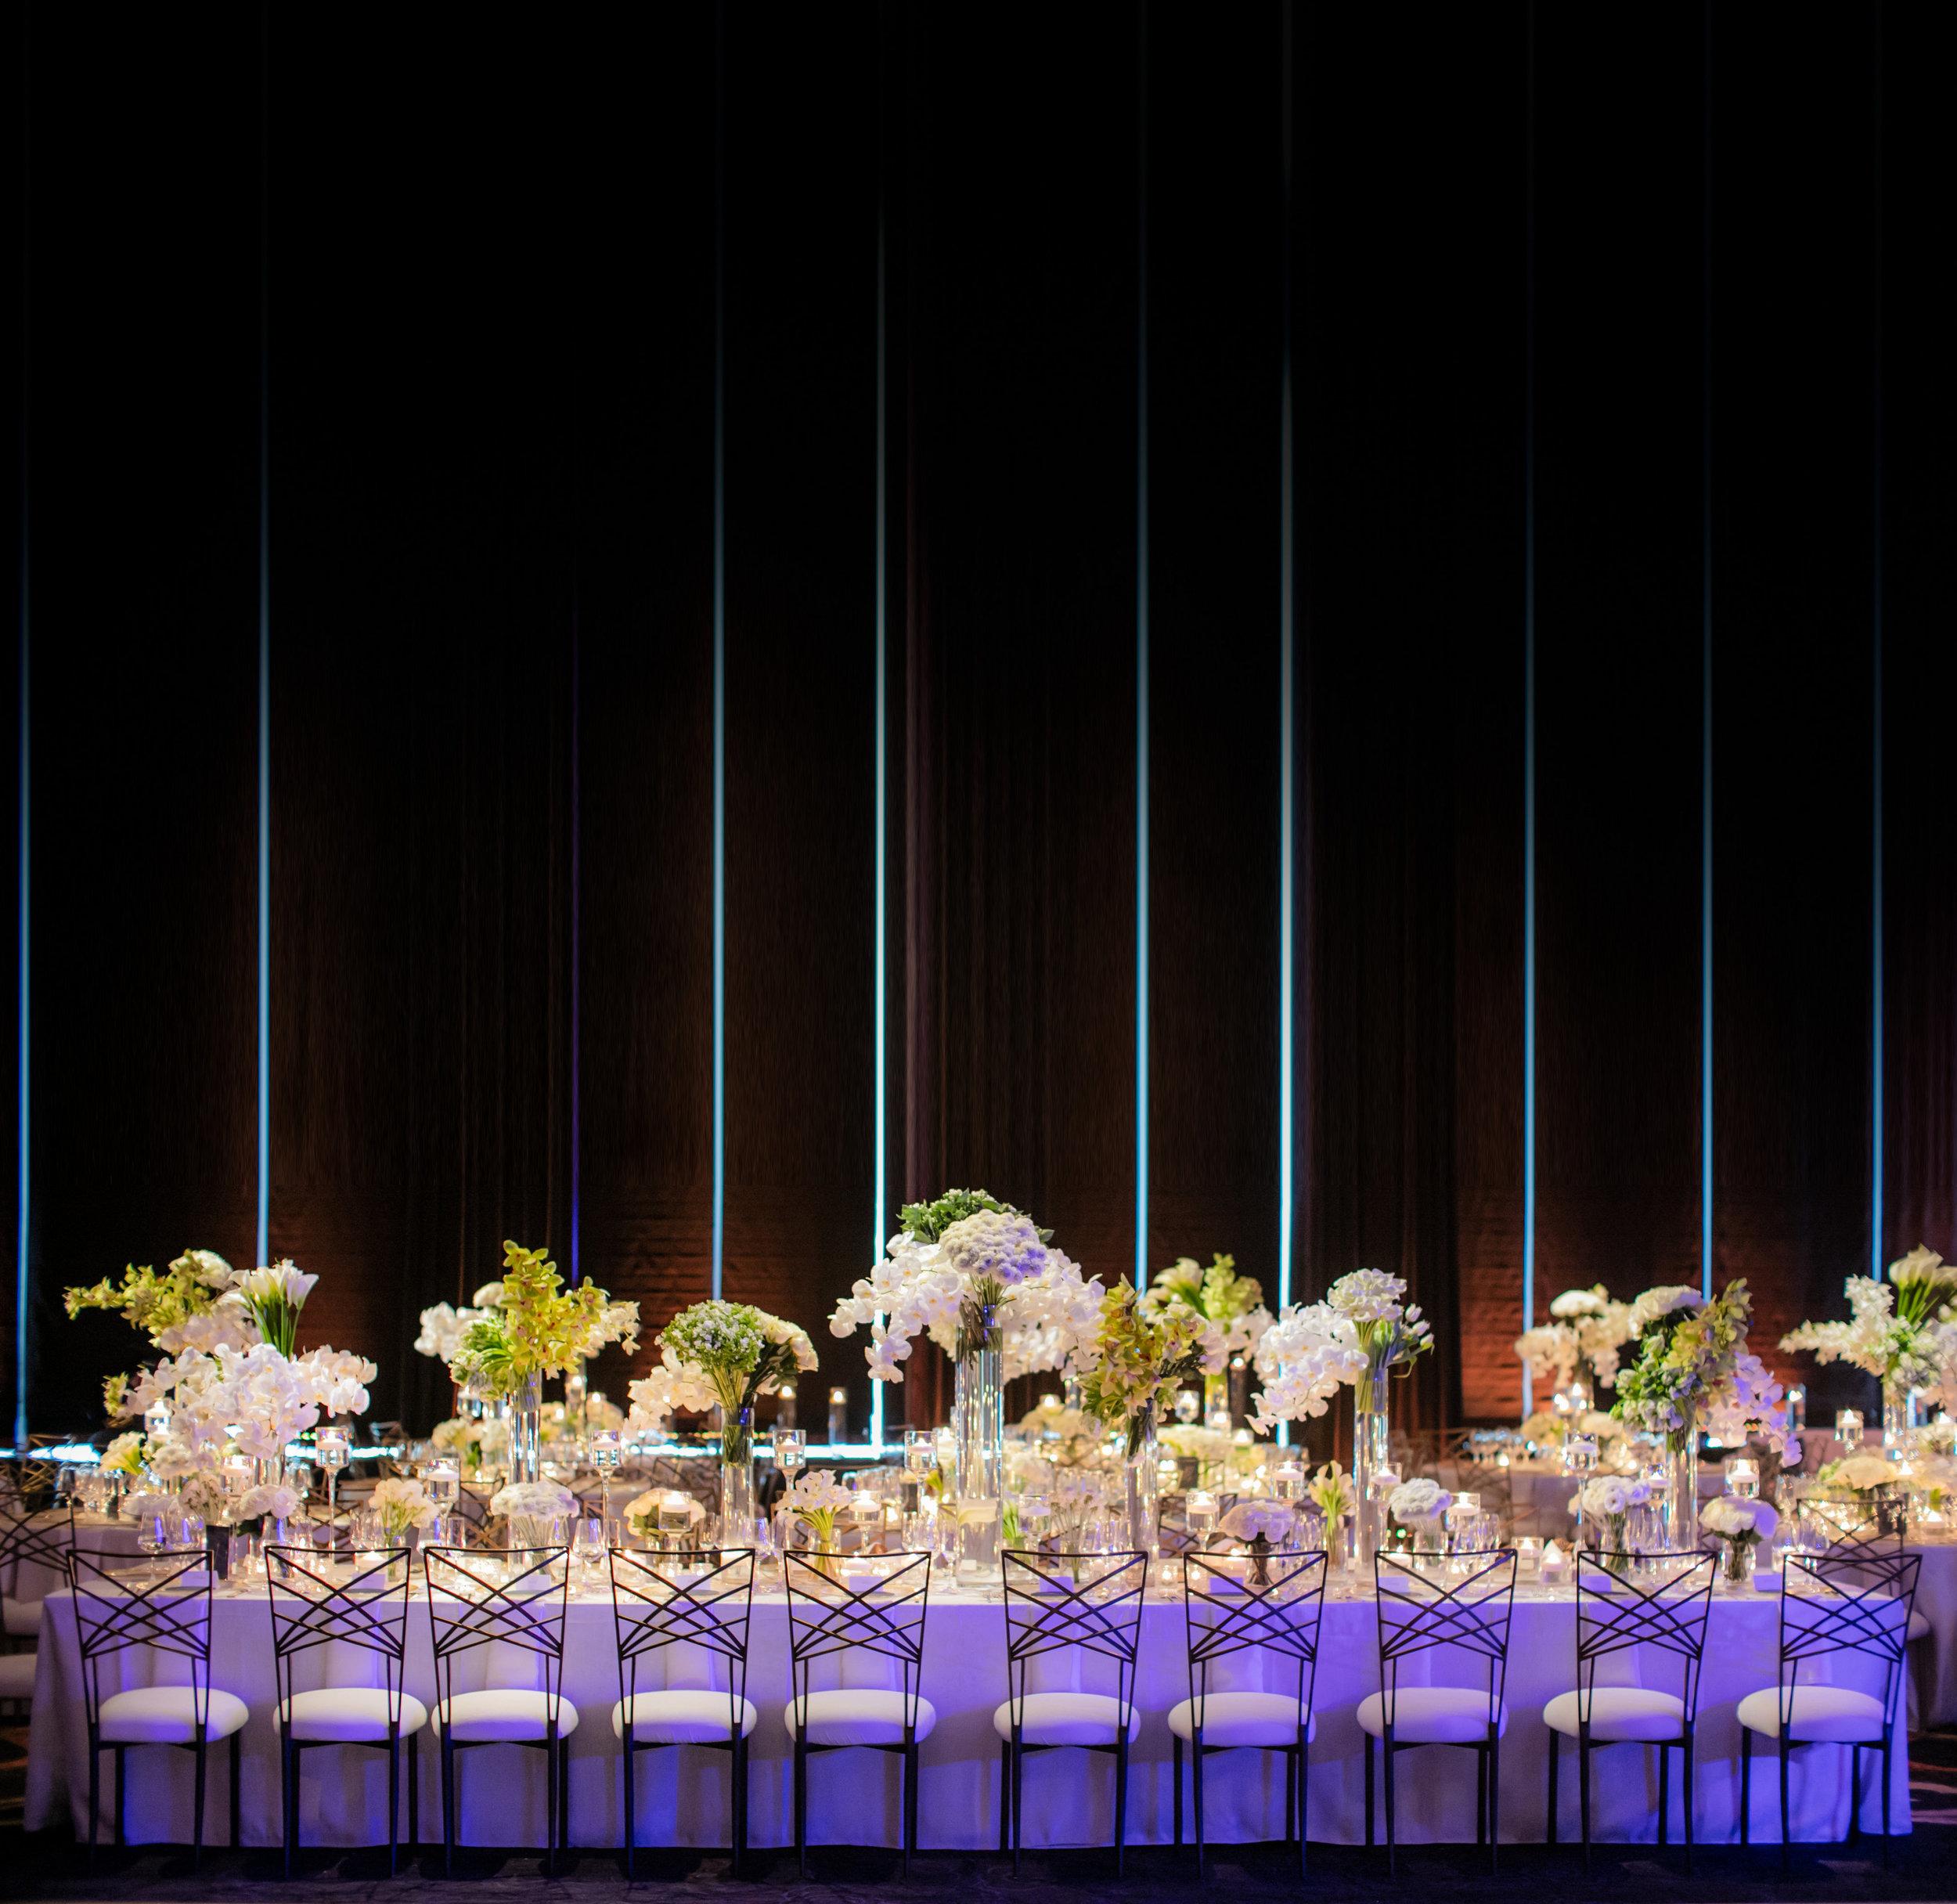 Andrea-Freeman-Events-NY-Wedding-Planner-Mandarin-Oriental-Wedding-3.jpg